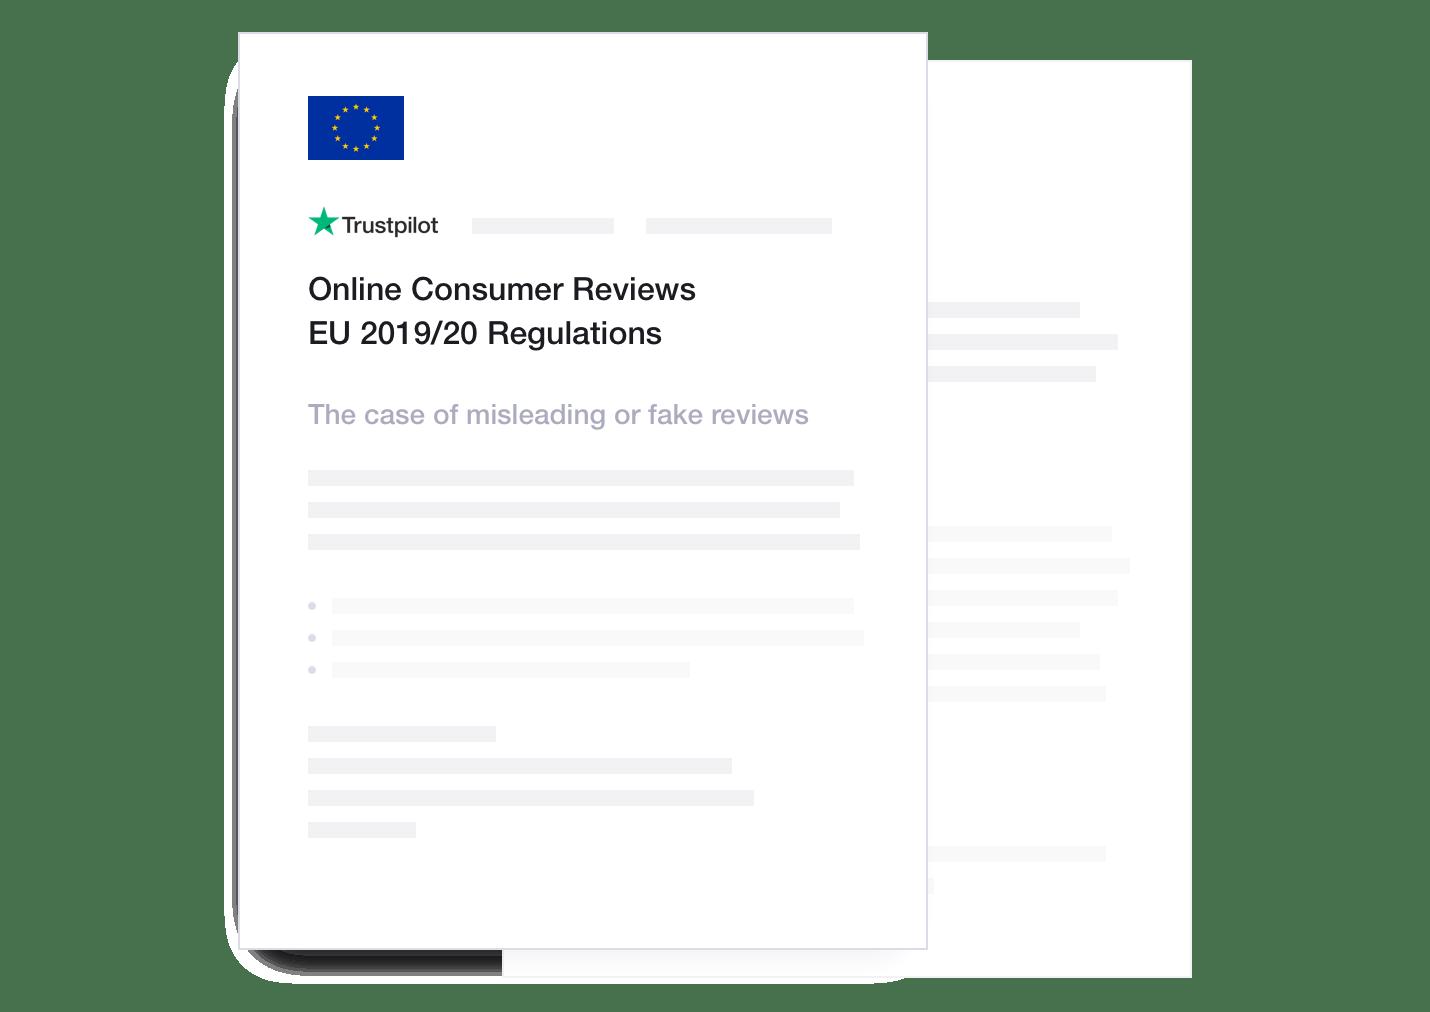 Trustpilot compliance to EU Regulations